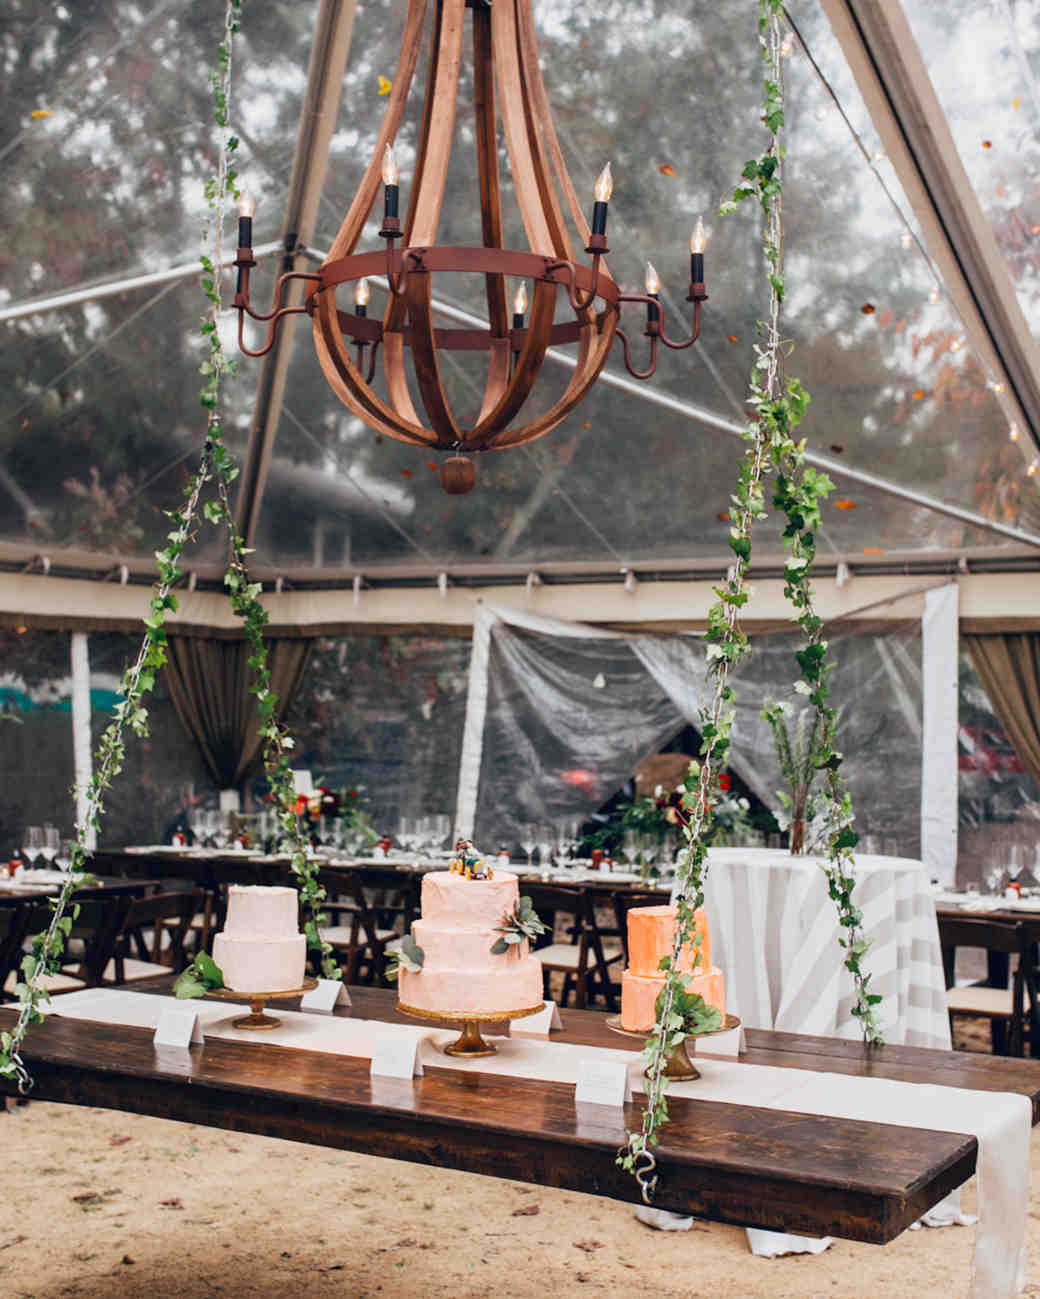 thea-rachit-wedding-cakes-0785-s112016-0715.jpg